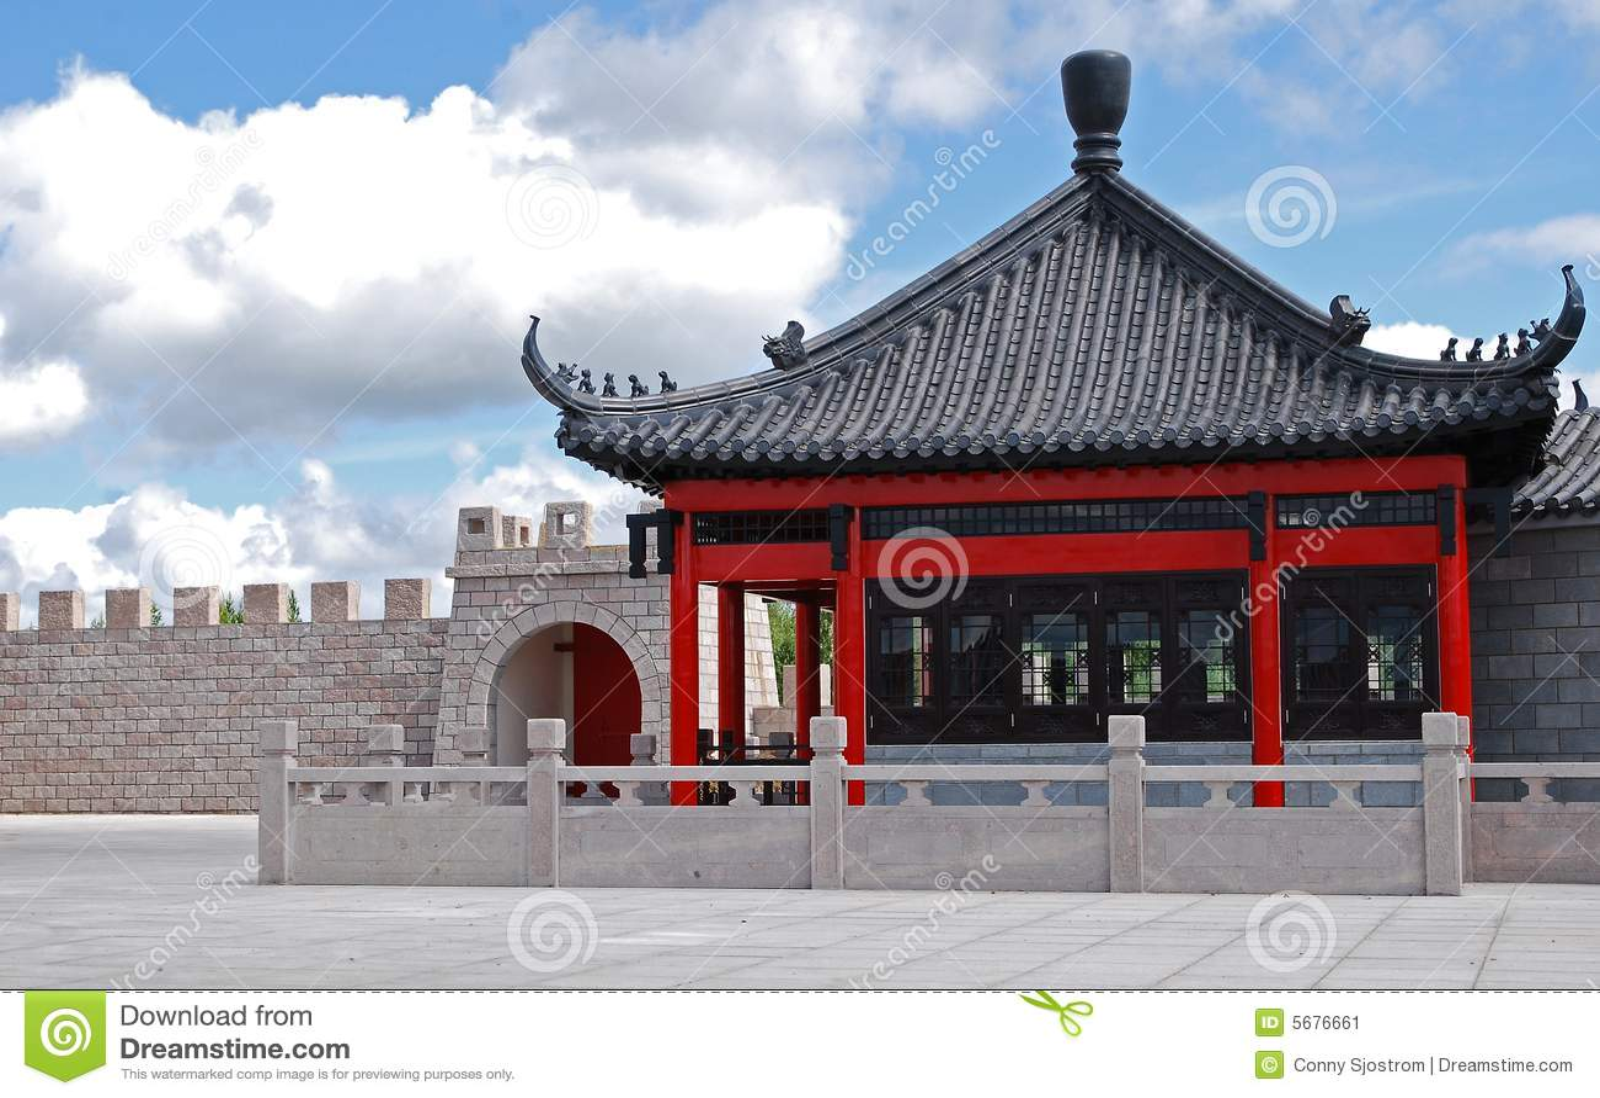 maison chinoise image stock image du architecture maison 5676661. Black Bedroom Furniture Sets. Home Design Ideas